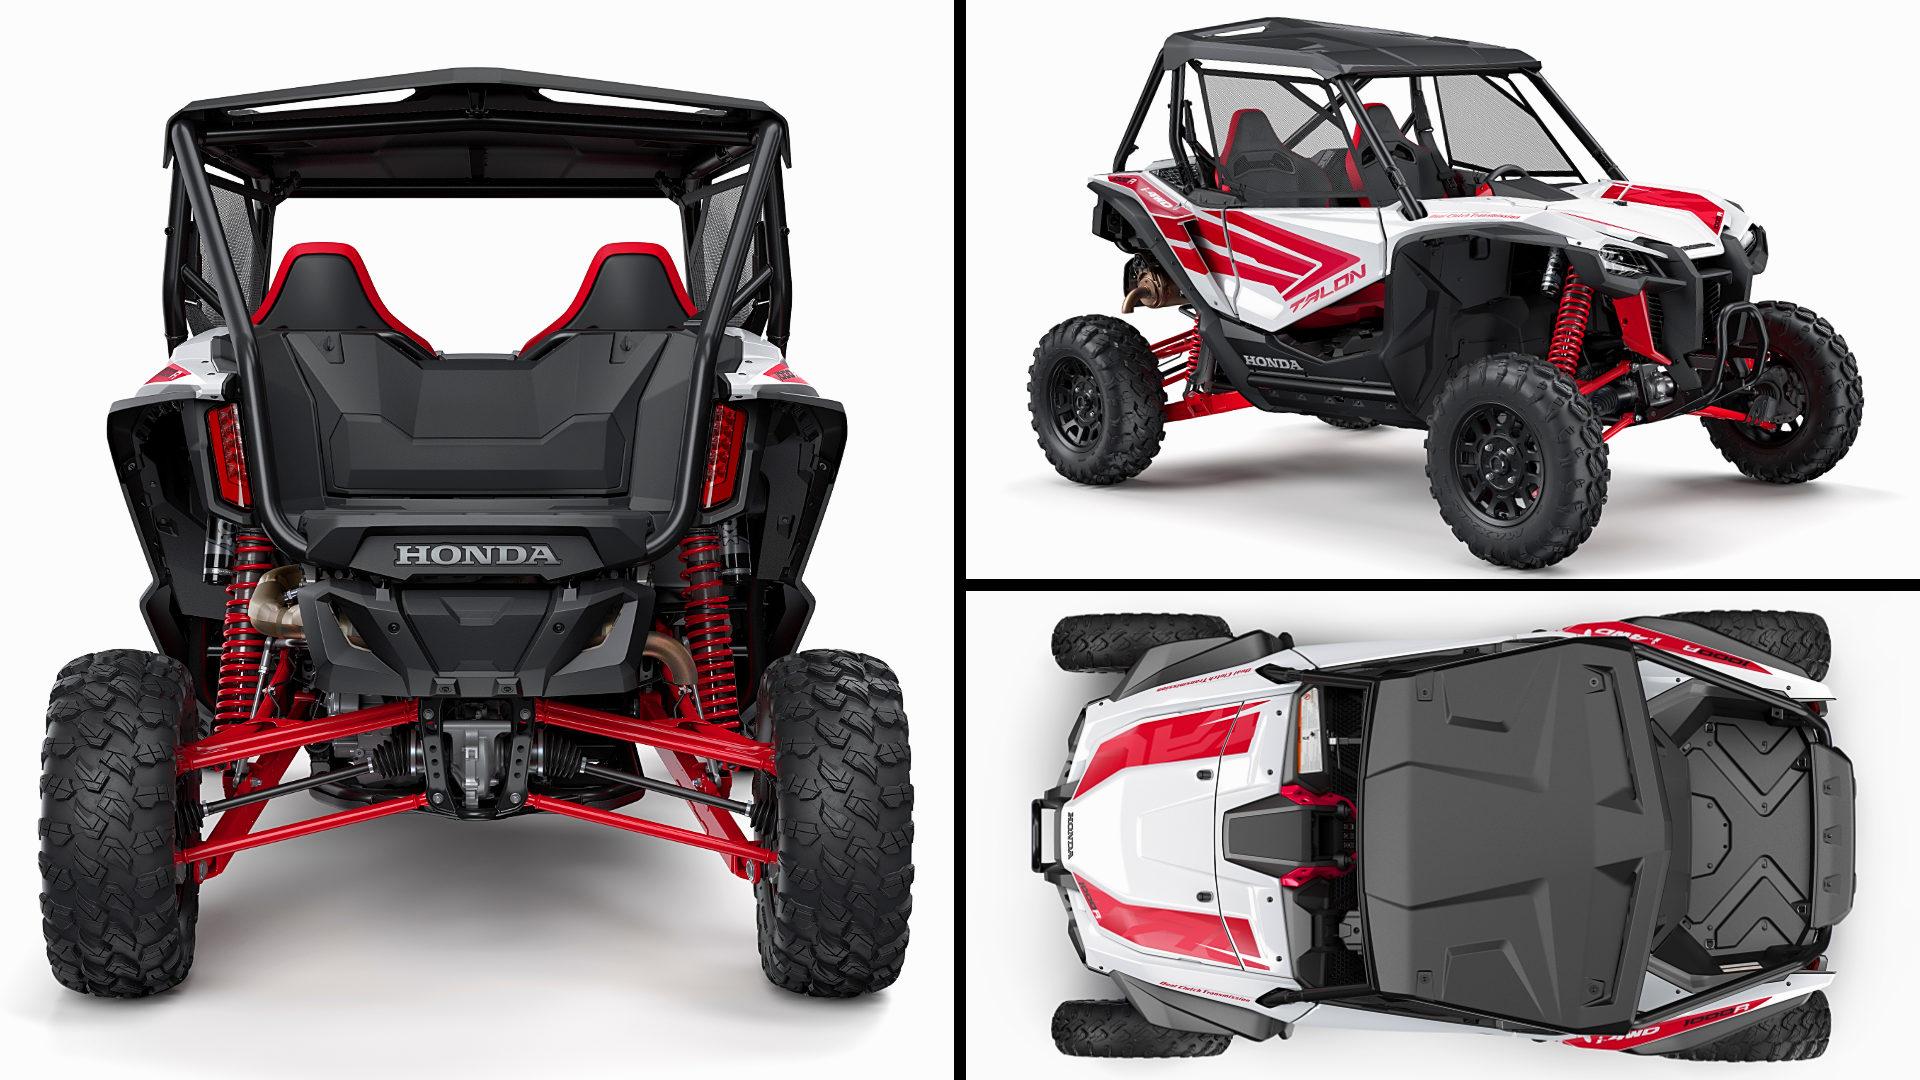 2021 Honda UTV Models Talon 1000R